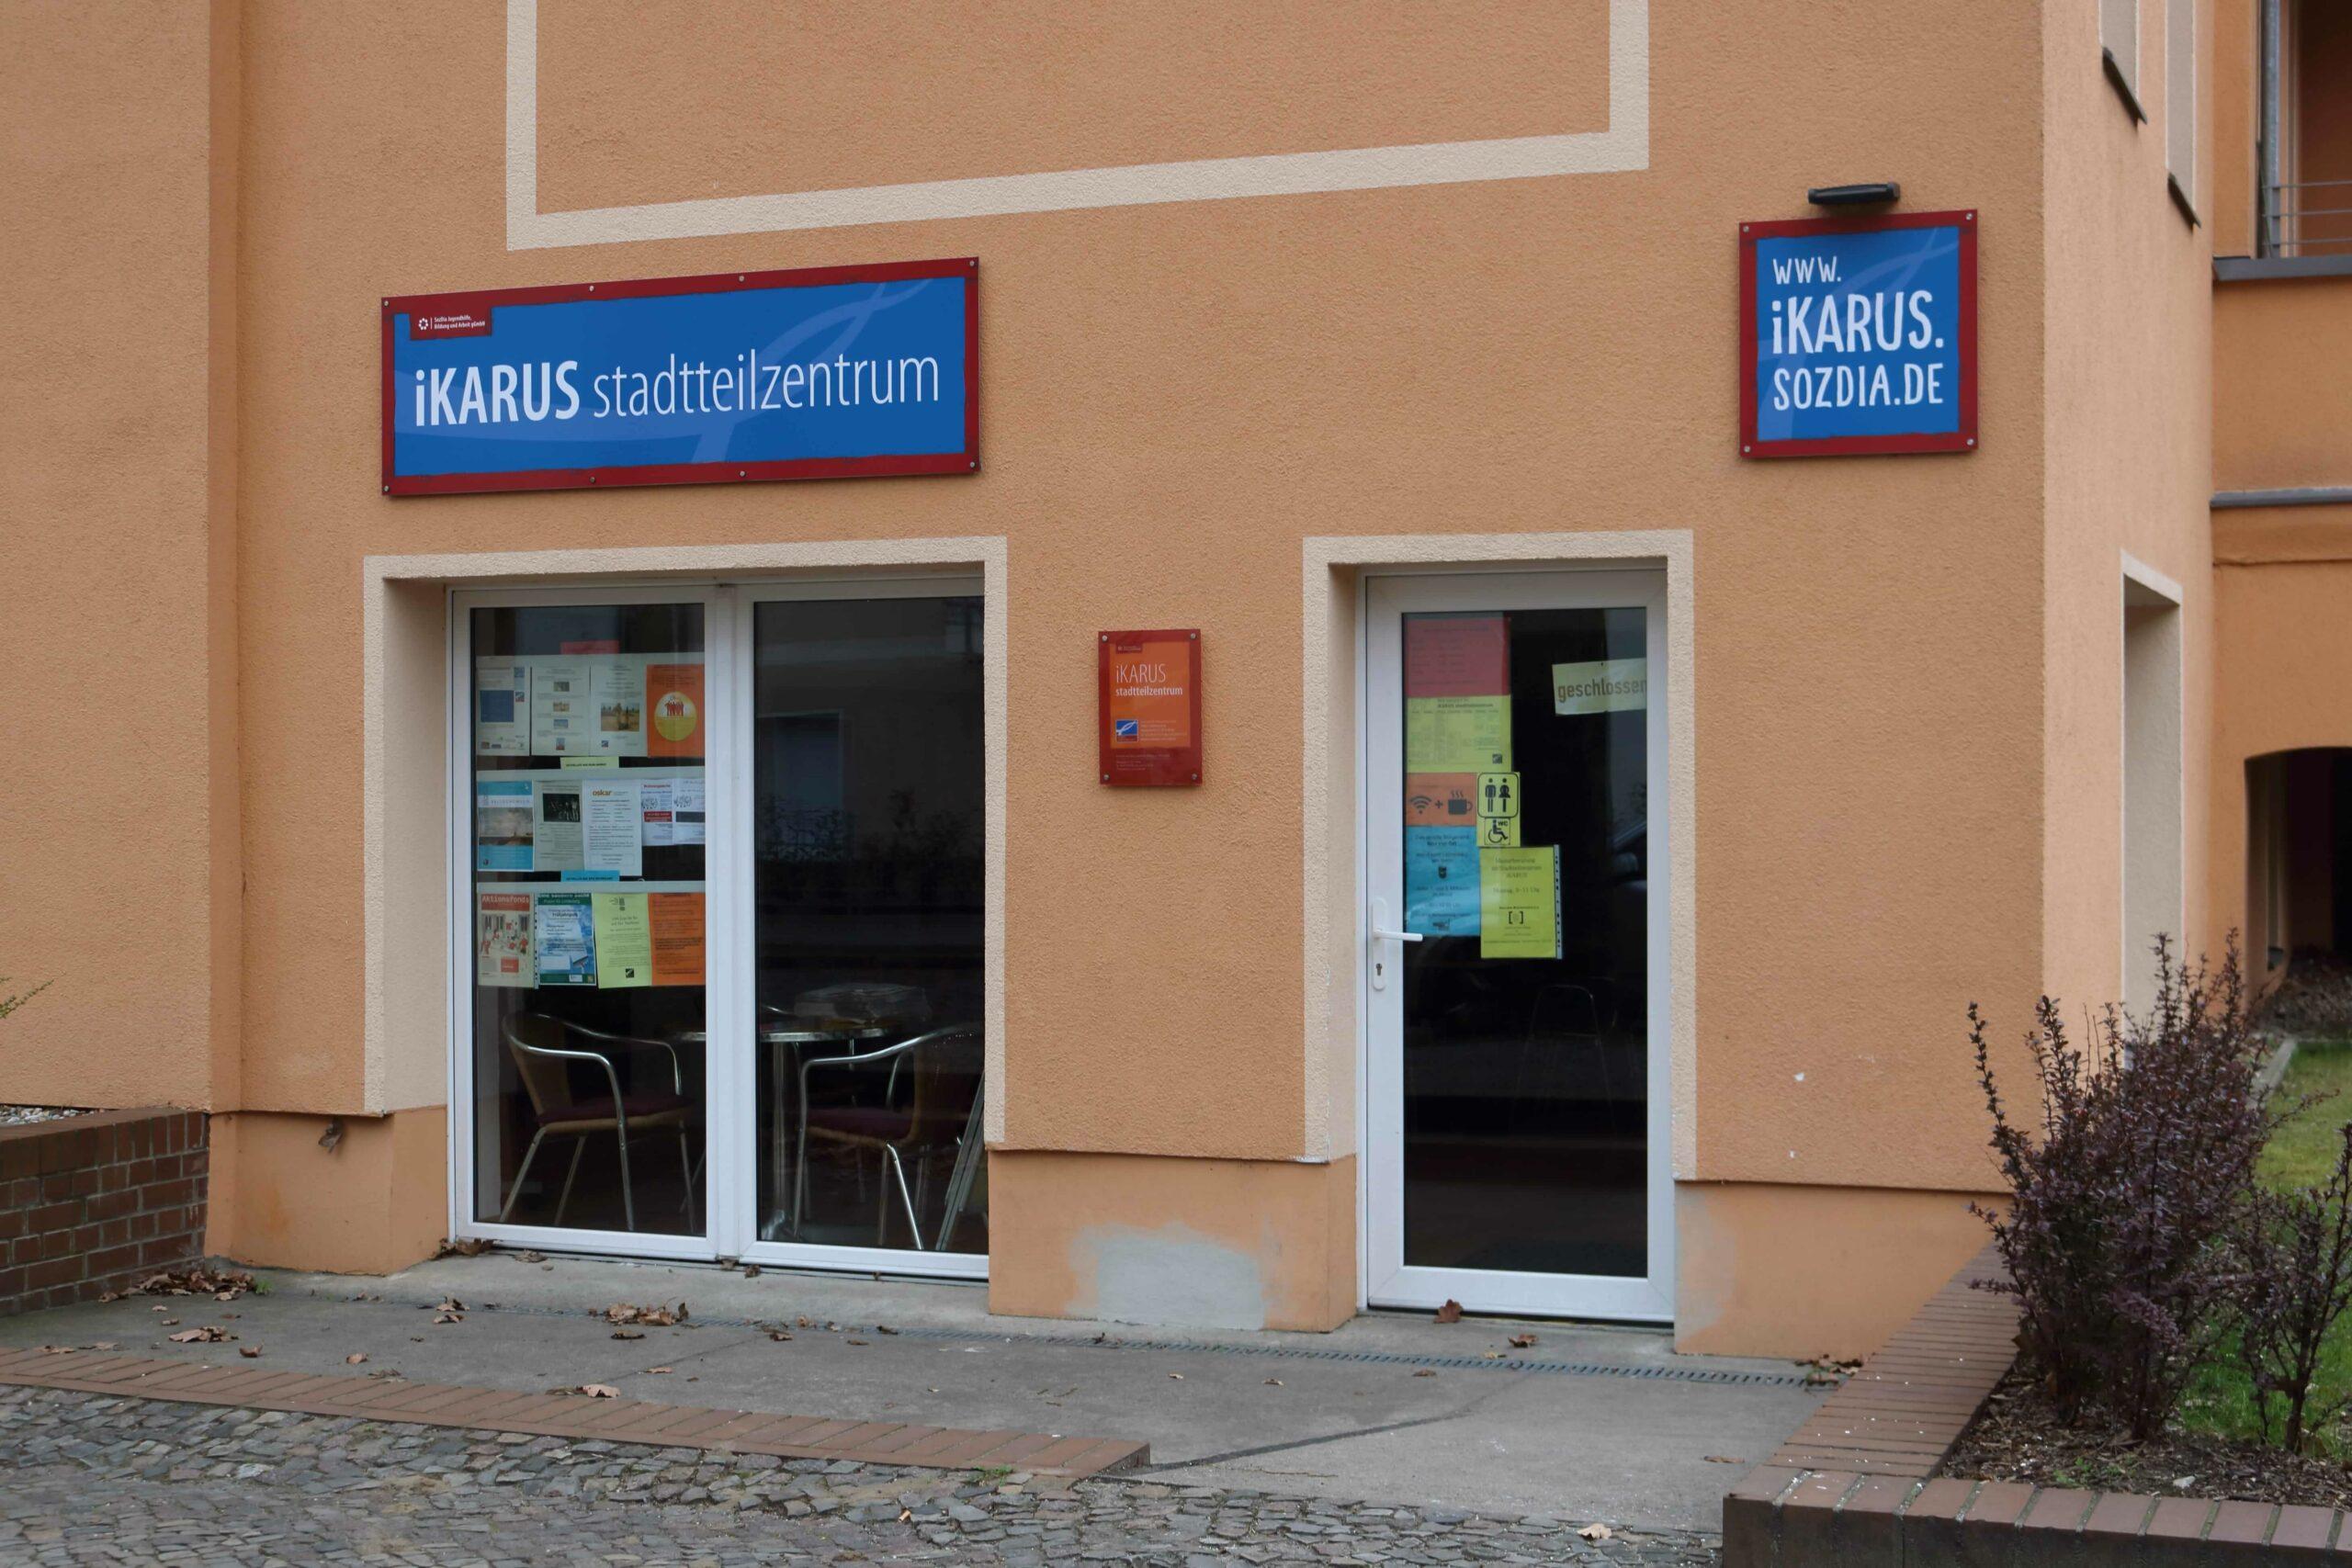 Bürgeramt Ikarus - Stadtteilzentrum - Wandlitzstraße